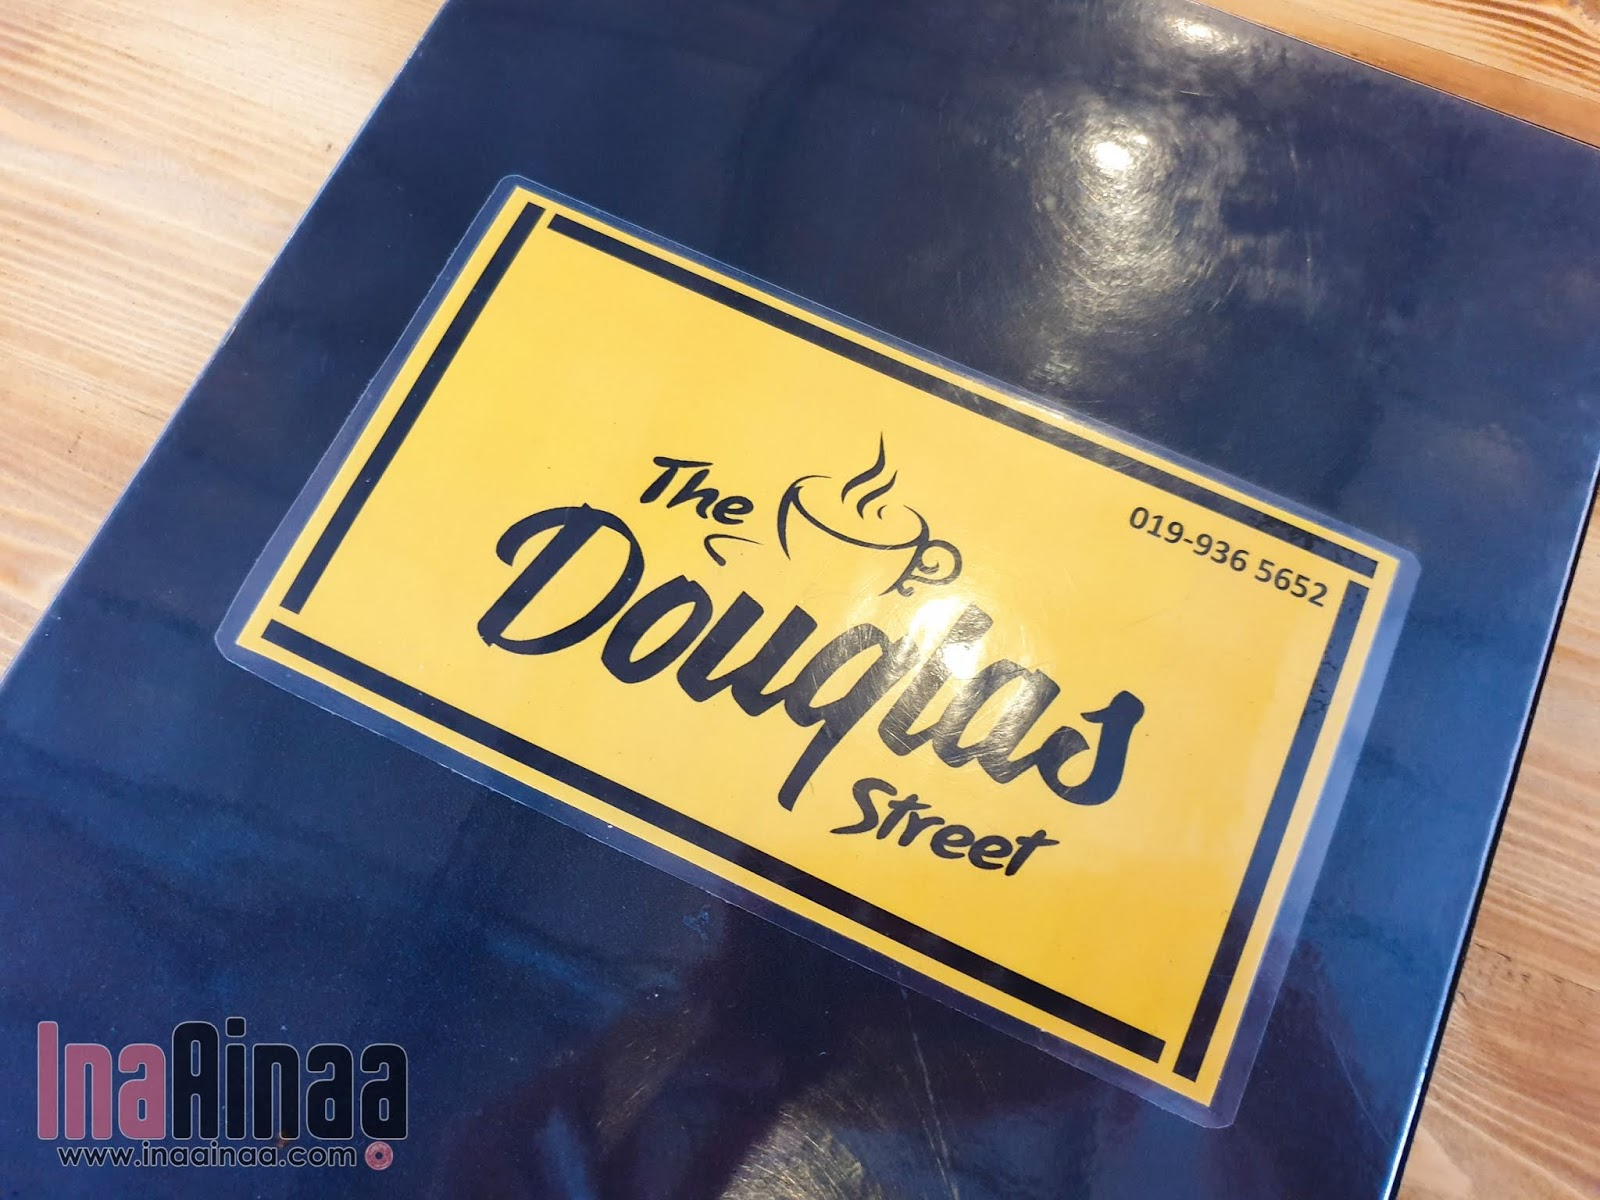 THE DOUGLAS STREET TANJUNG MALIM - Hak Milik Ina Ainaa